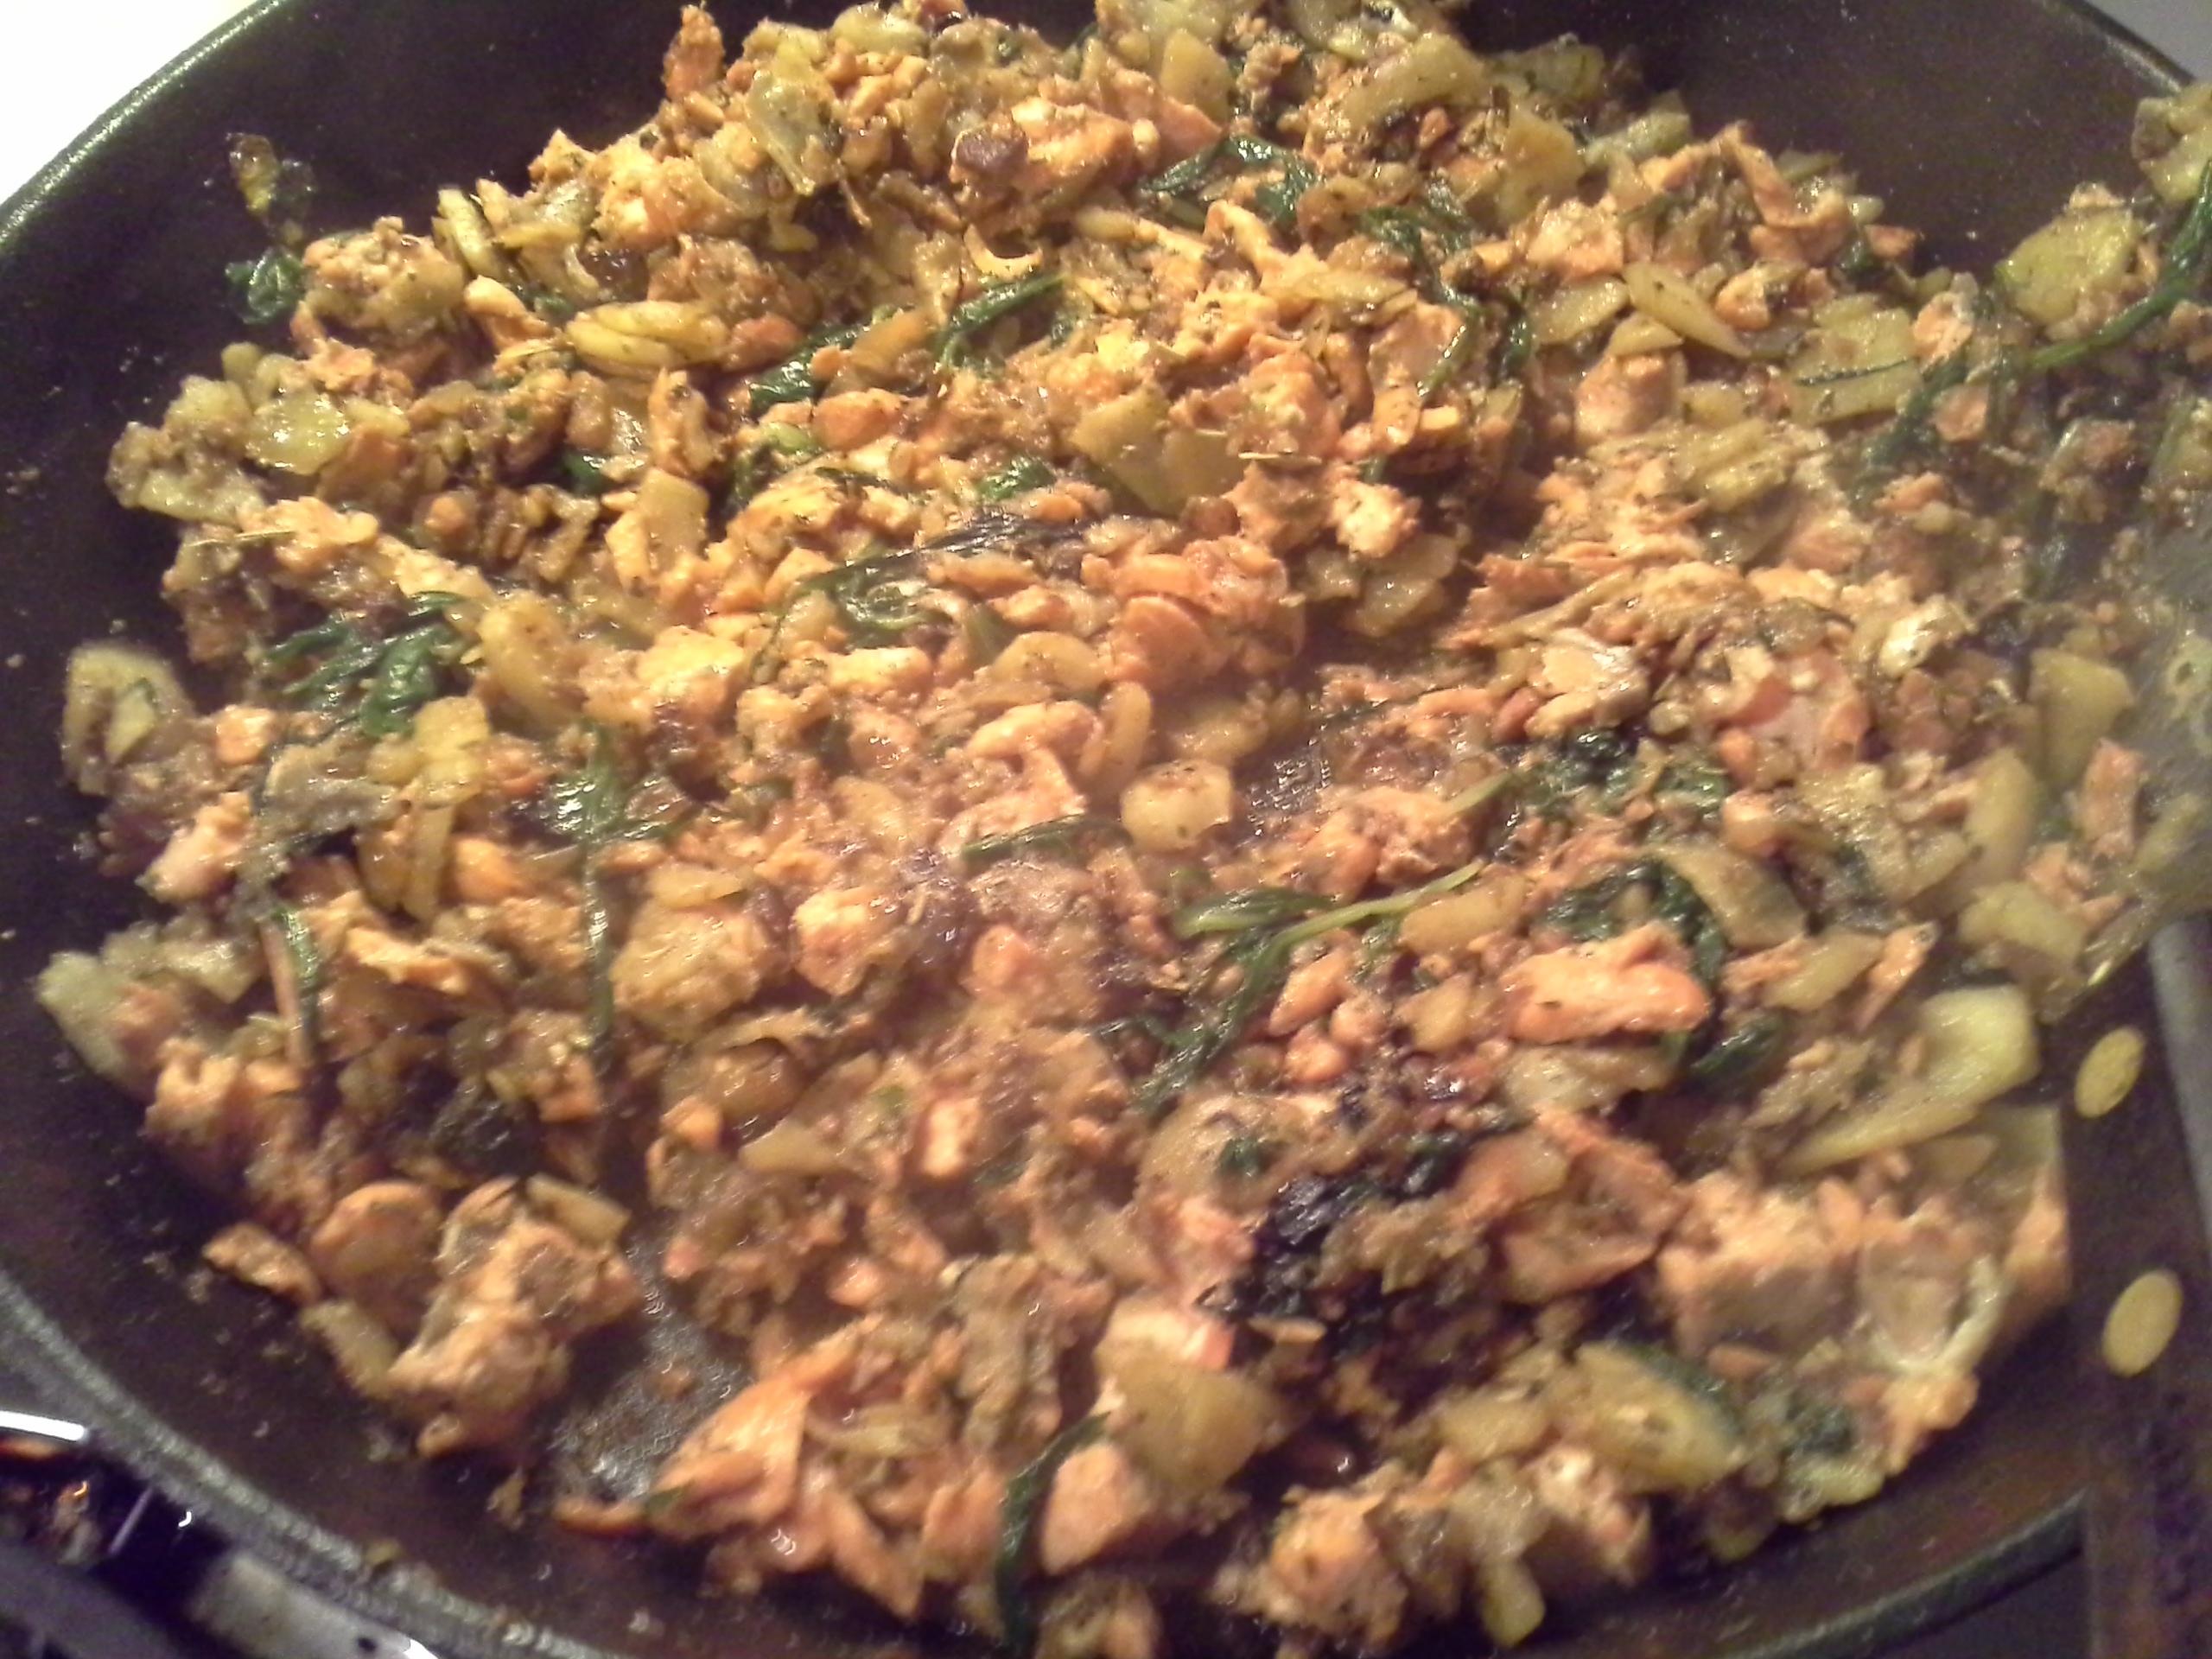 Dinner: 10:15 p.m.   8 oz. salmon, 1/2 celeriac root, greens mix, 2 Tbsp. coconut oil, herbs & spices